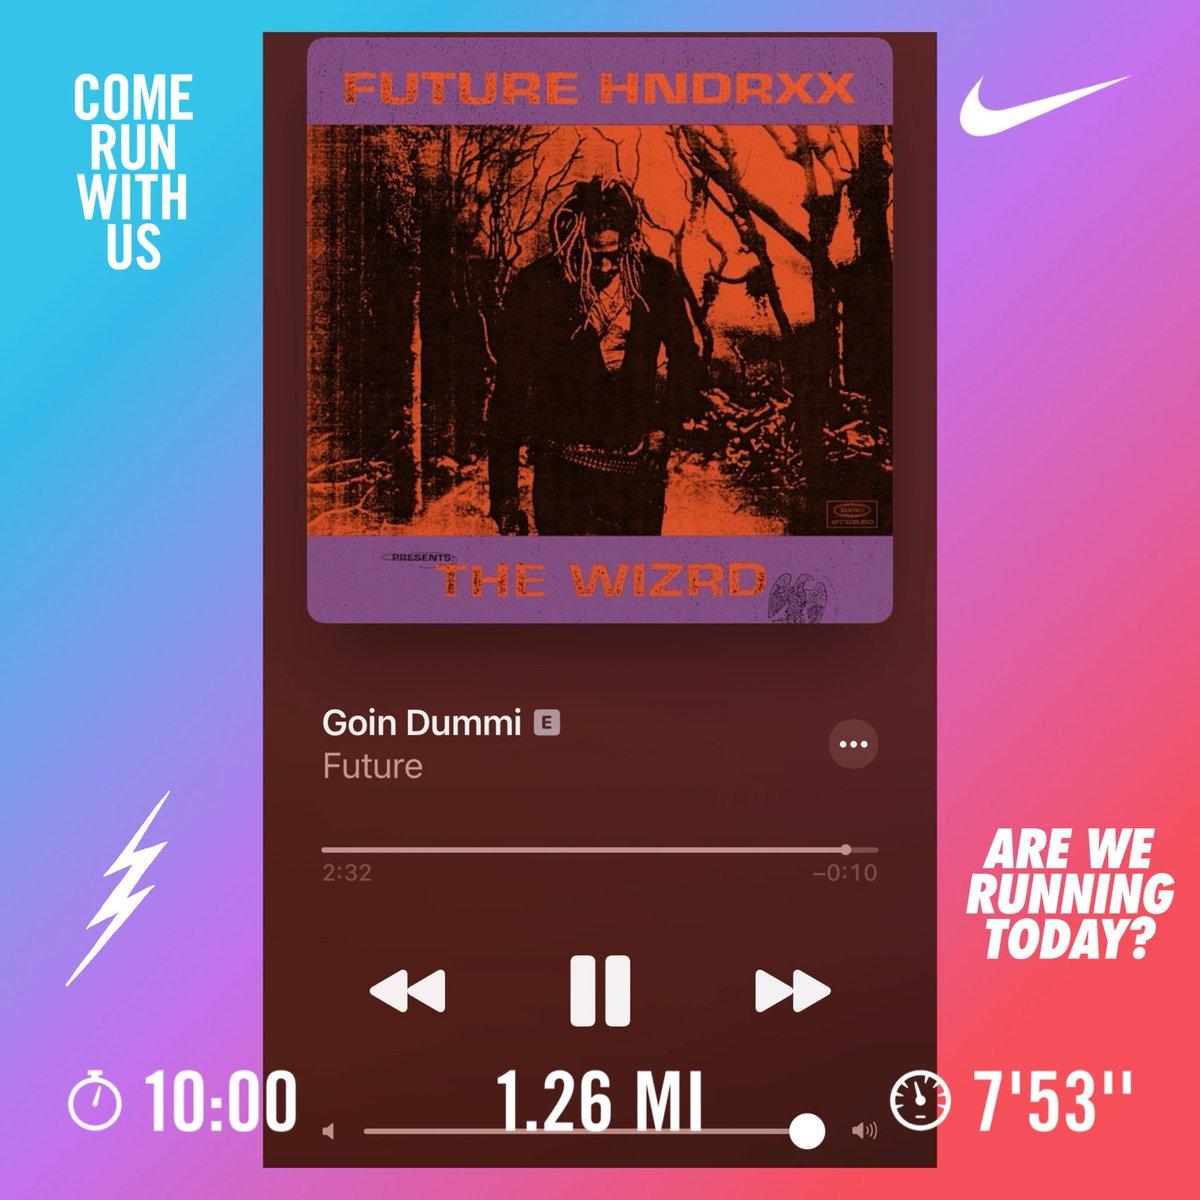 262 Straight Weeks #gymlife #gymrat #gymflow #chest #arms #abs #fitness #finishstrong #DjRaQuest #DjLife #Nikerunning #hustlehart #nike #nikerunning #FitDjs #MambaMentality